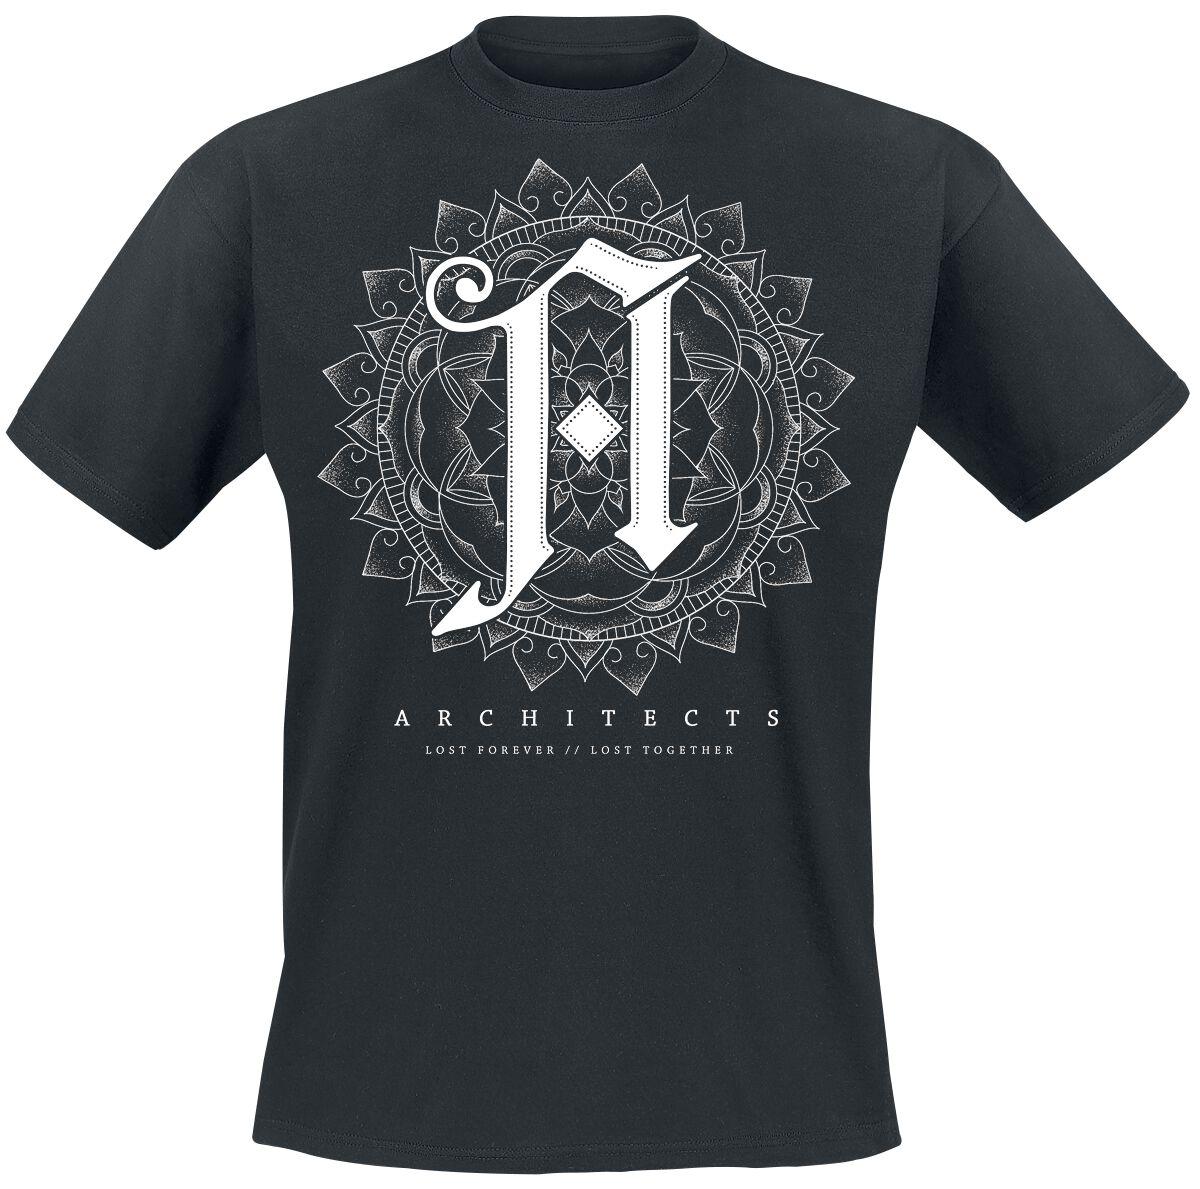 Zespoły - Koszulki - T-Shirt Architects Logo T-Shirt czarny - 361892